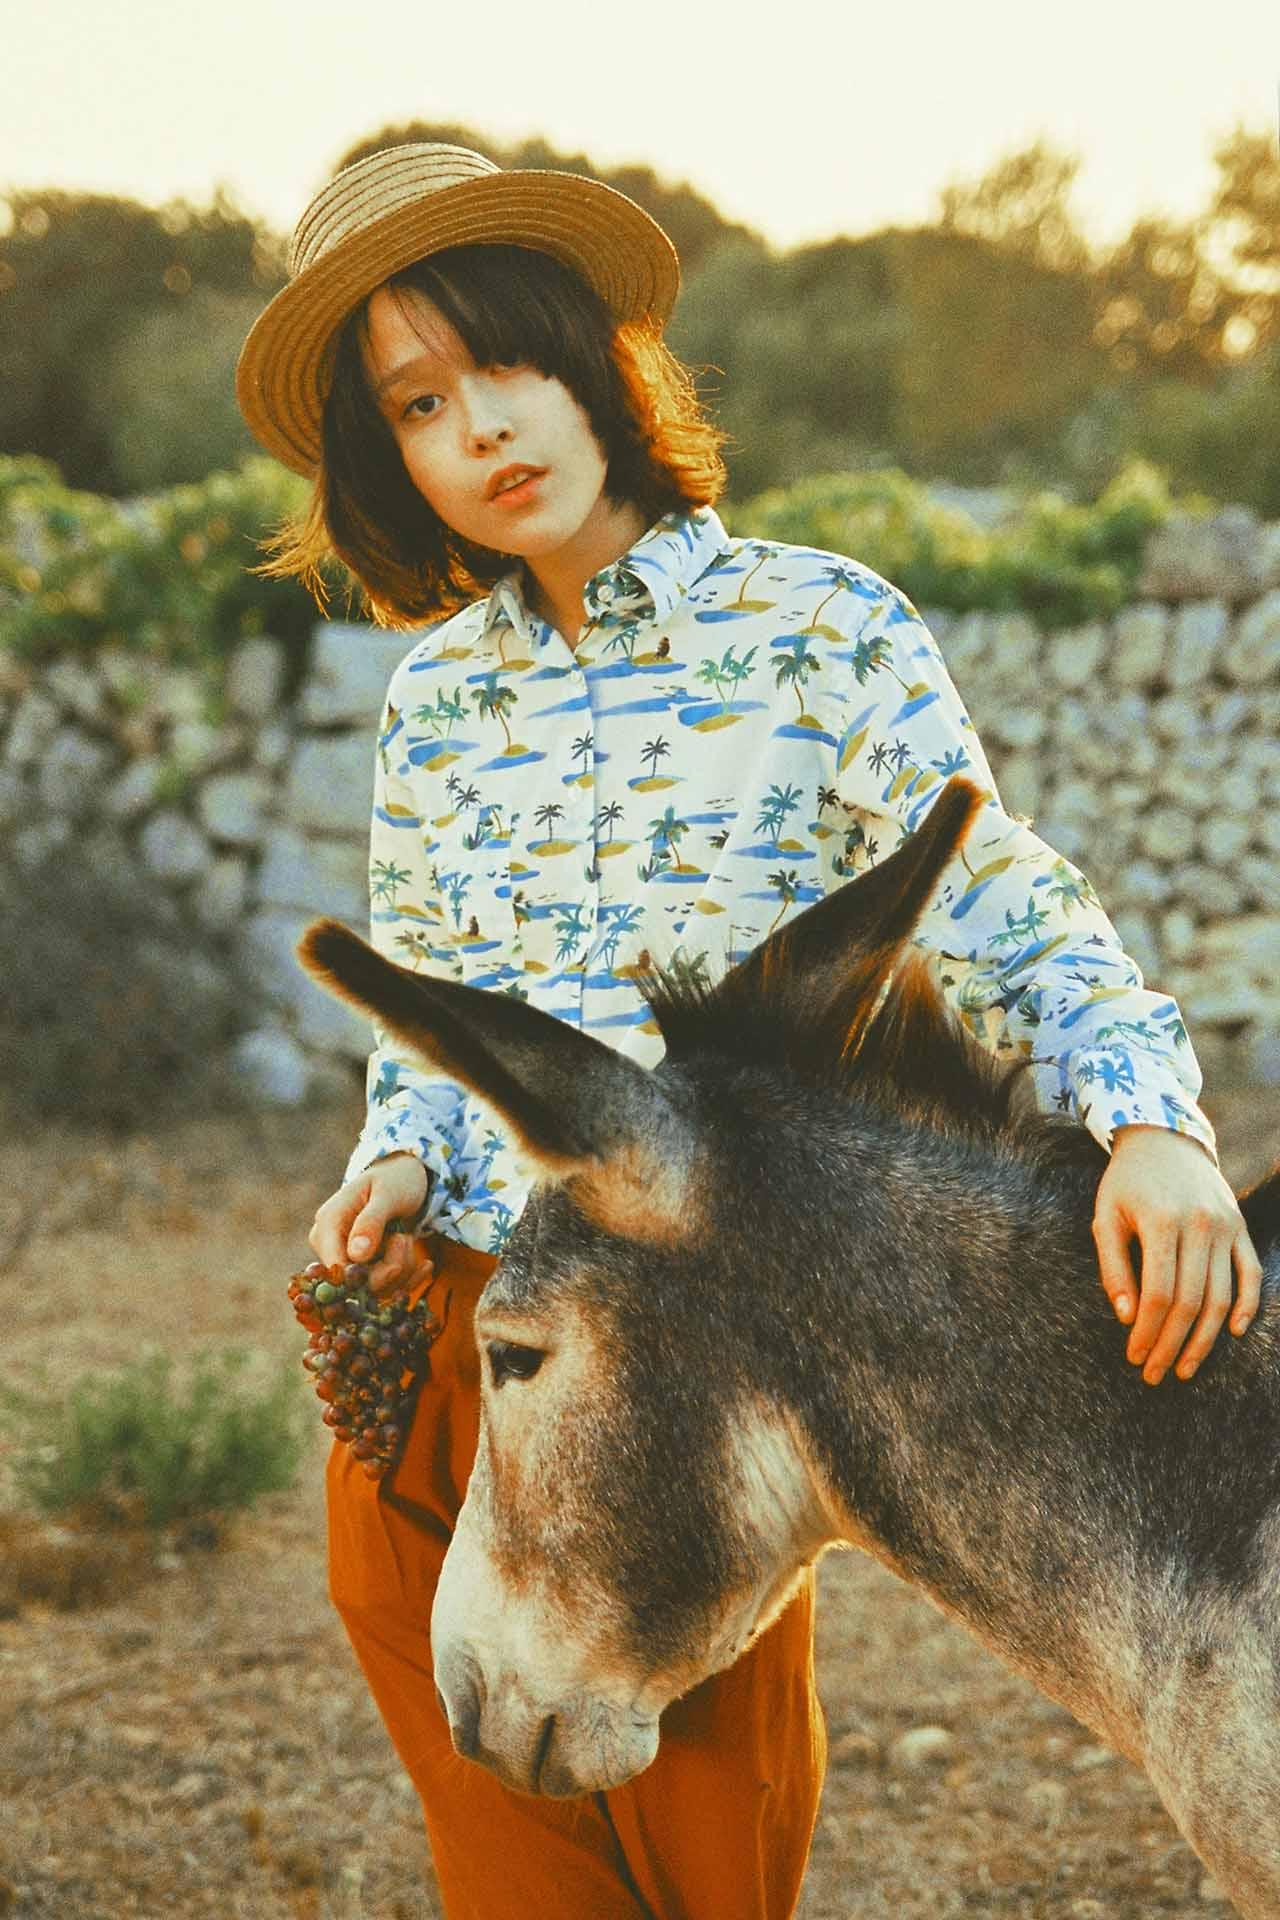 GKERO - Arthur et Philippine - arthur chaigneau